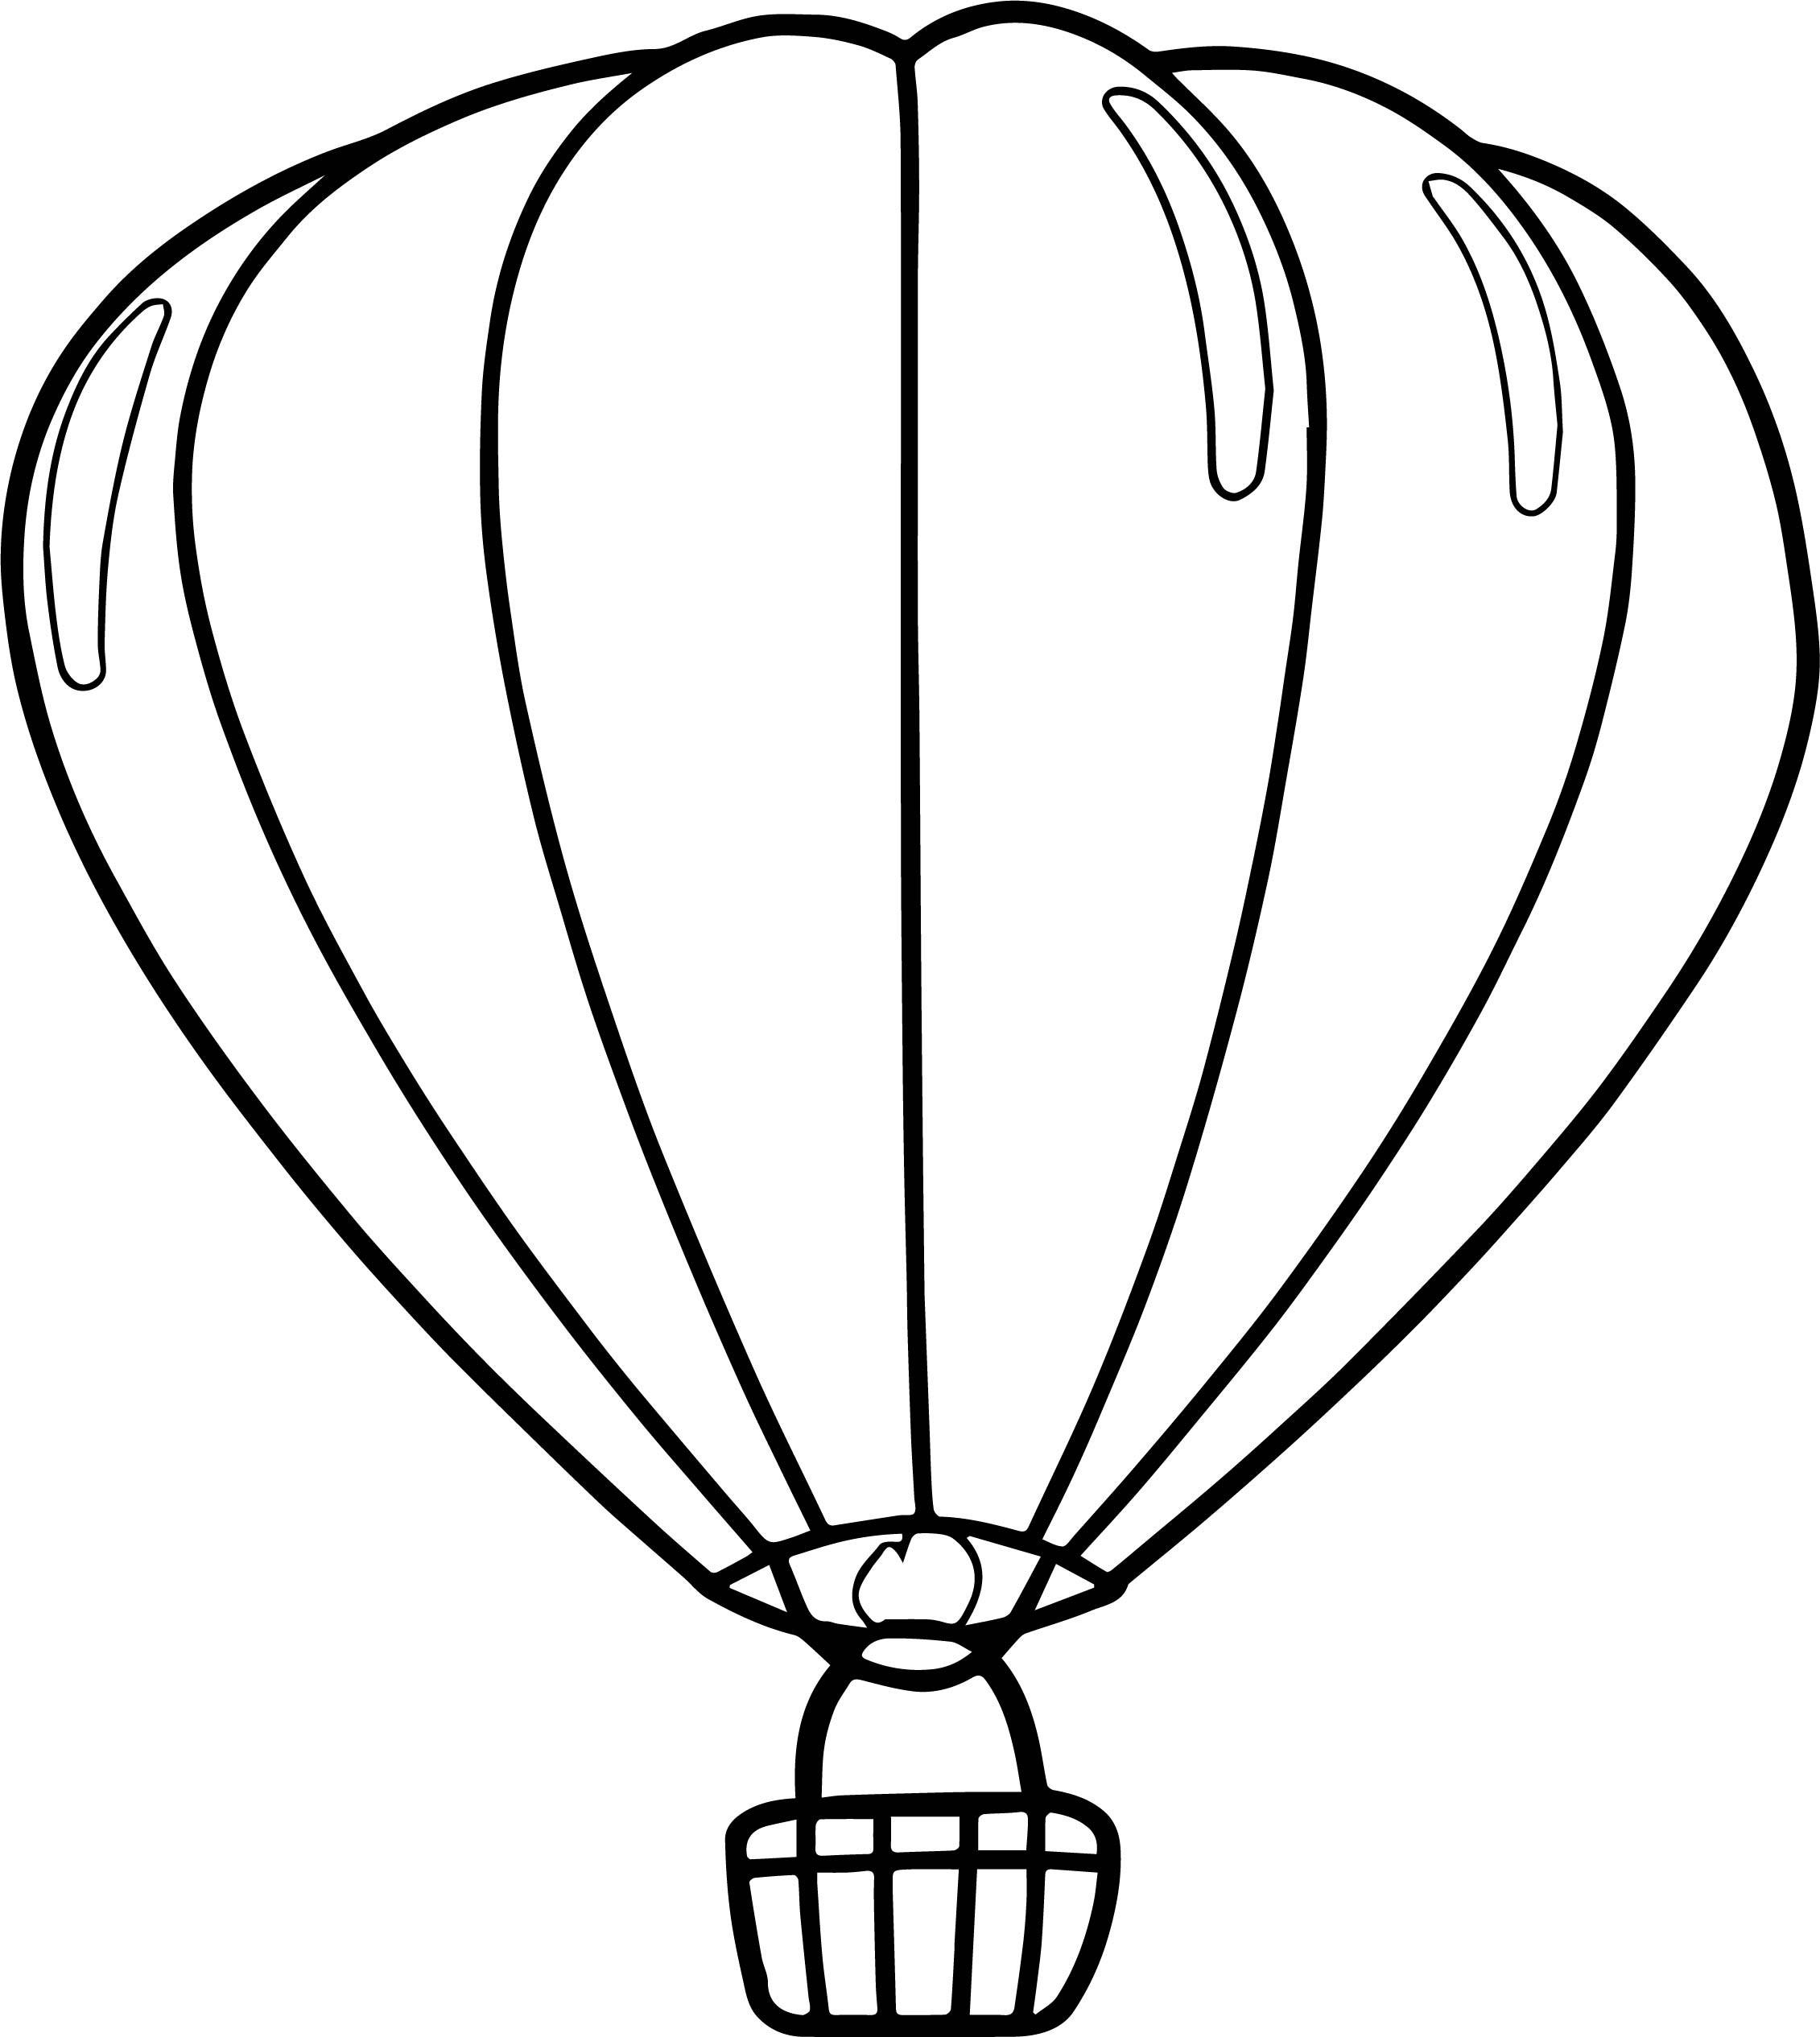 2261x2531 Drawings Of Hot Air Balloons Photo Album